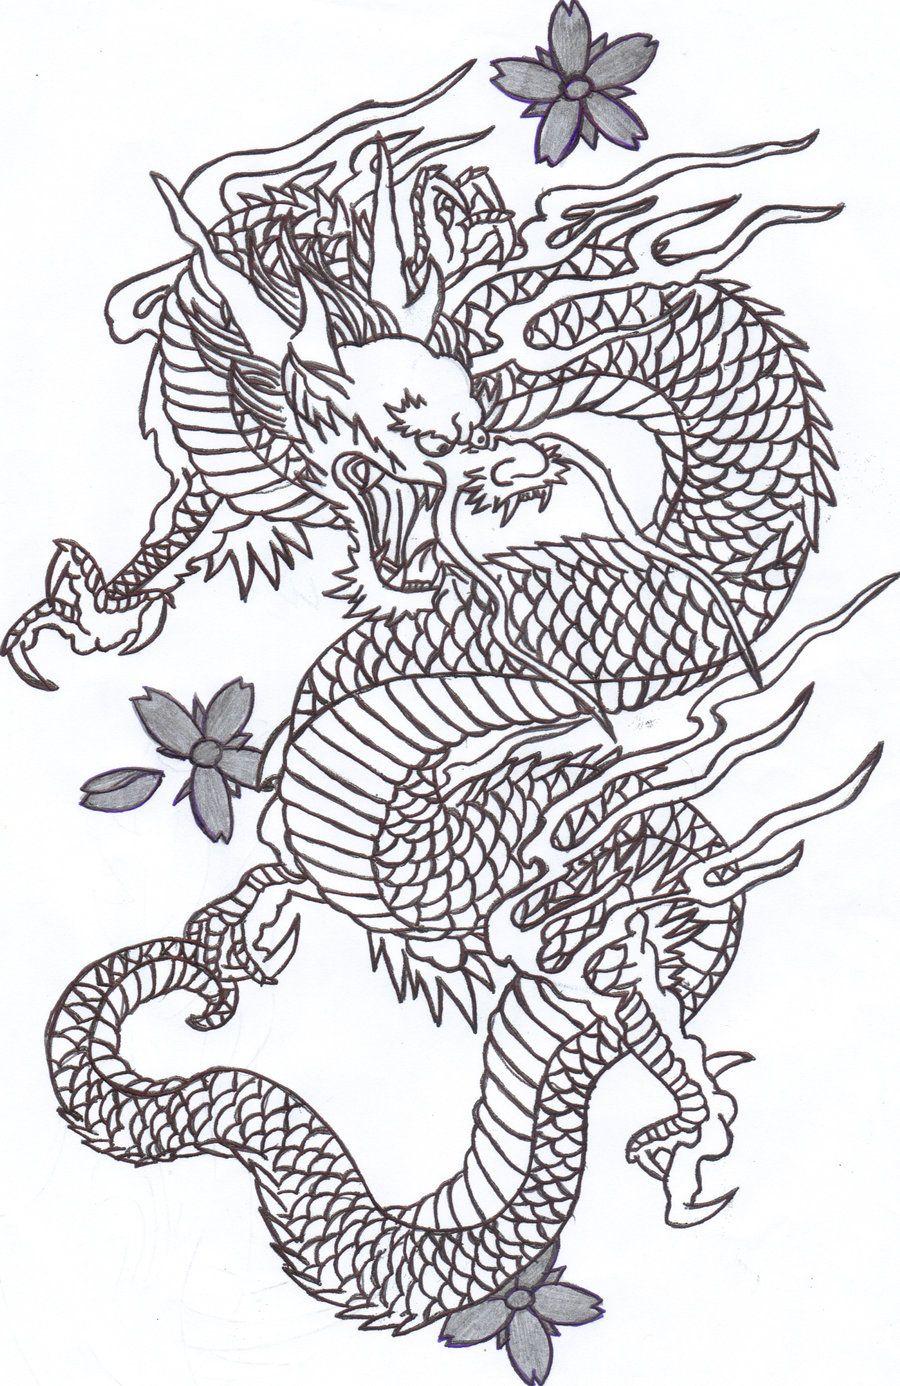 Dragon Outline Drawing : dragon, outline, drawing, Chinese, Dragon, Sunshine-vamp, DeviantART, Japanese, Tattoos,, Tattoo, Outline,